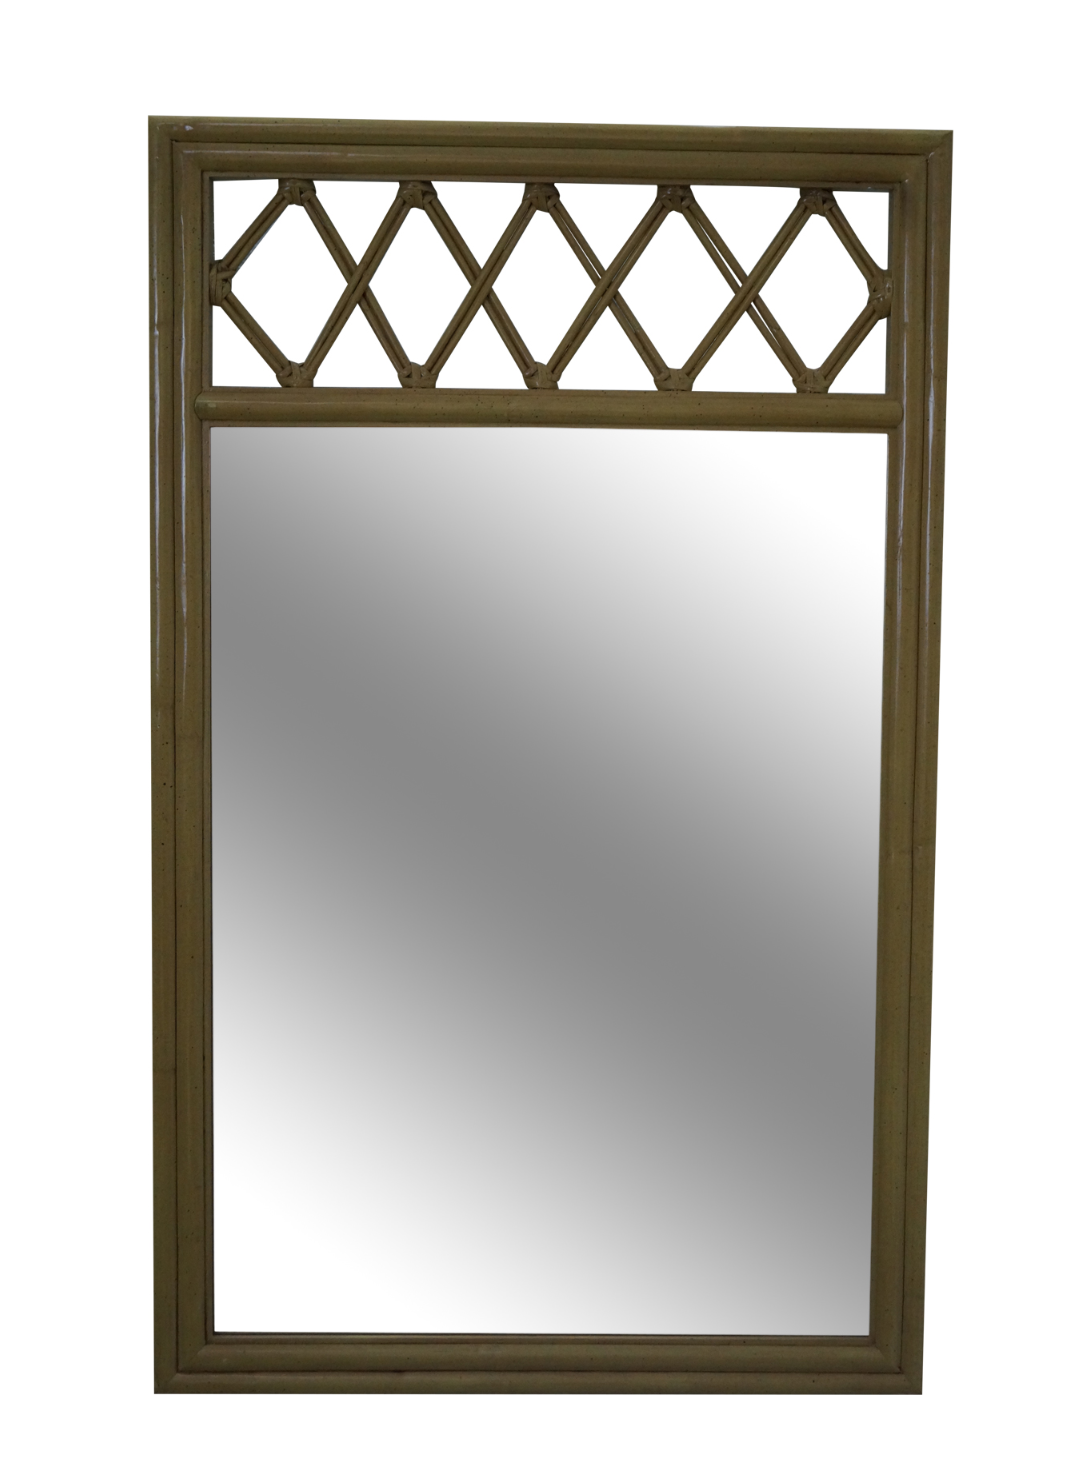 ficks reed vintage painted rattan u0026 bamboo mirror - Bamboo Mirror